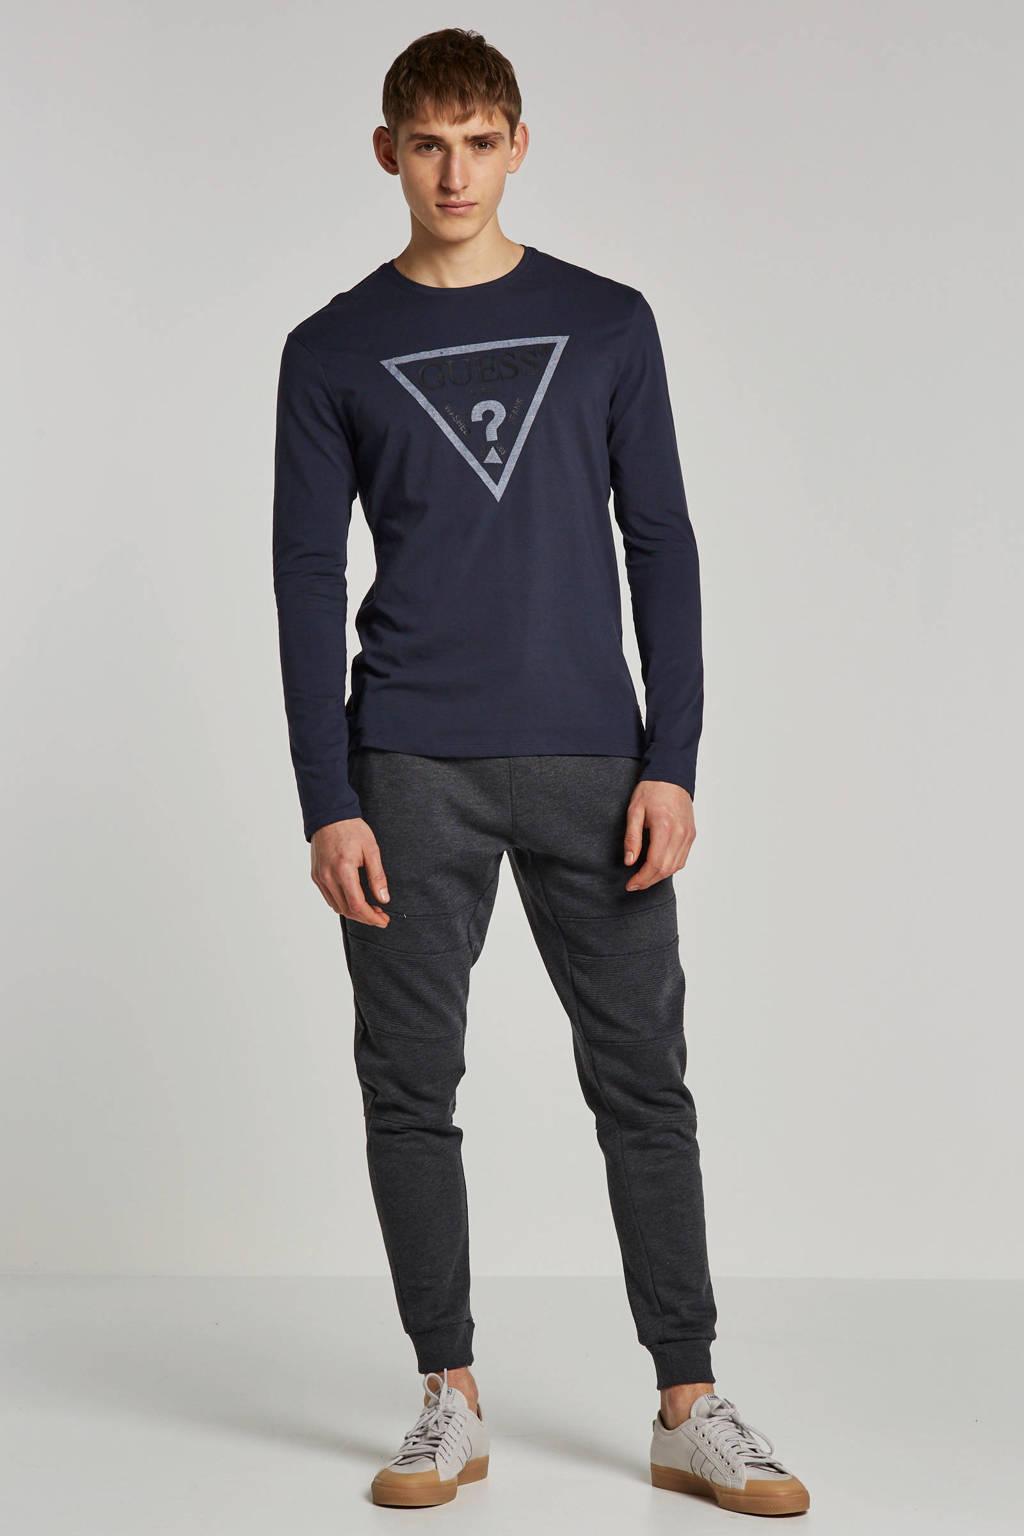 GUESS T-shirt lange mouw, Donkerblauw